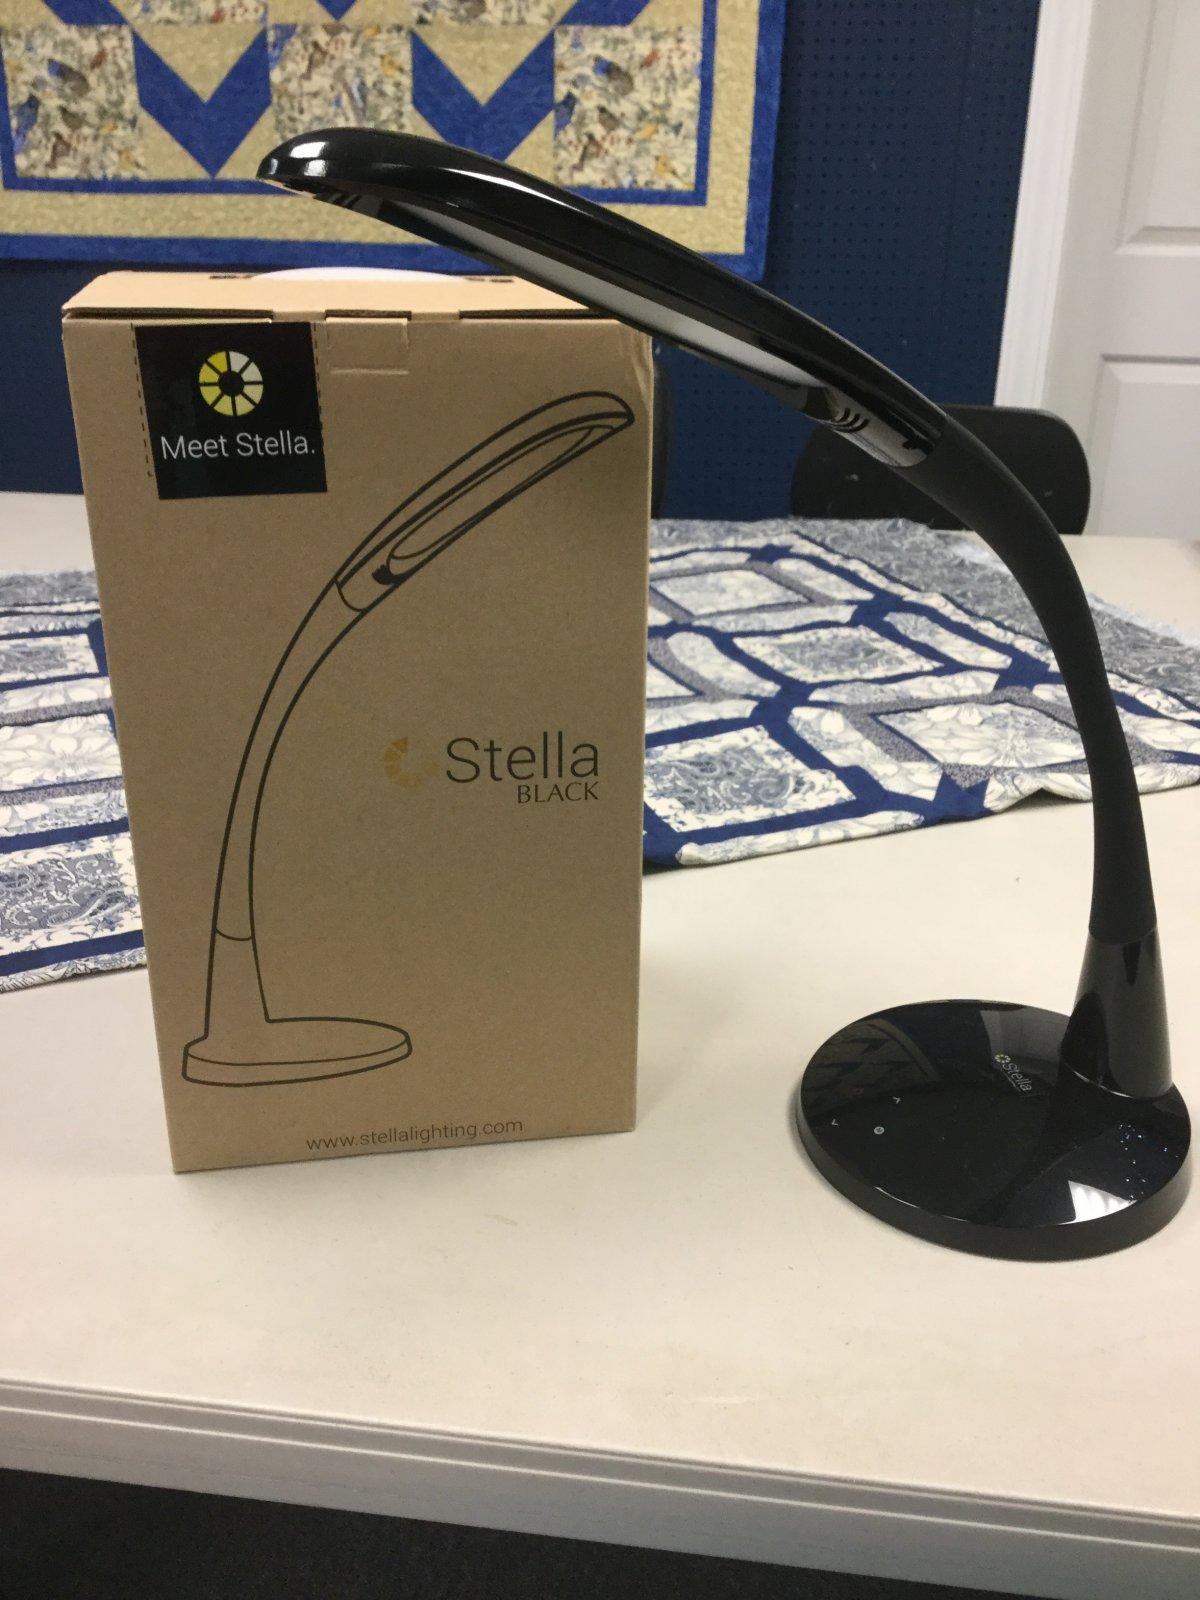 Stella Desk Top Lamp